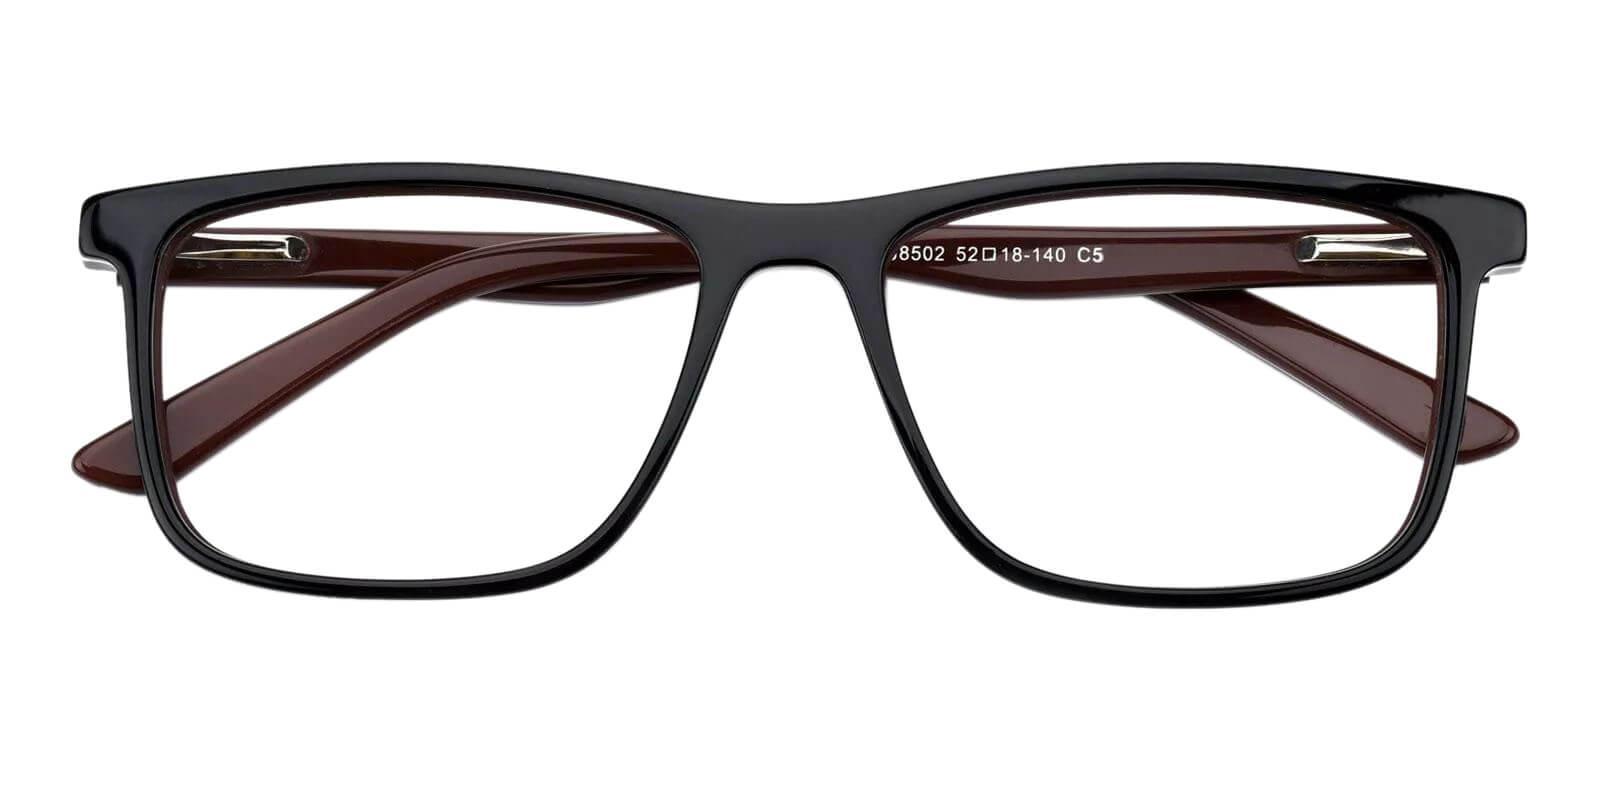 Fay Brown Acetate Eyeglasses , Fashion , SpringHinges , UniversalBridgeFit Frames from ABBE Glasses